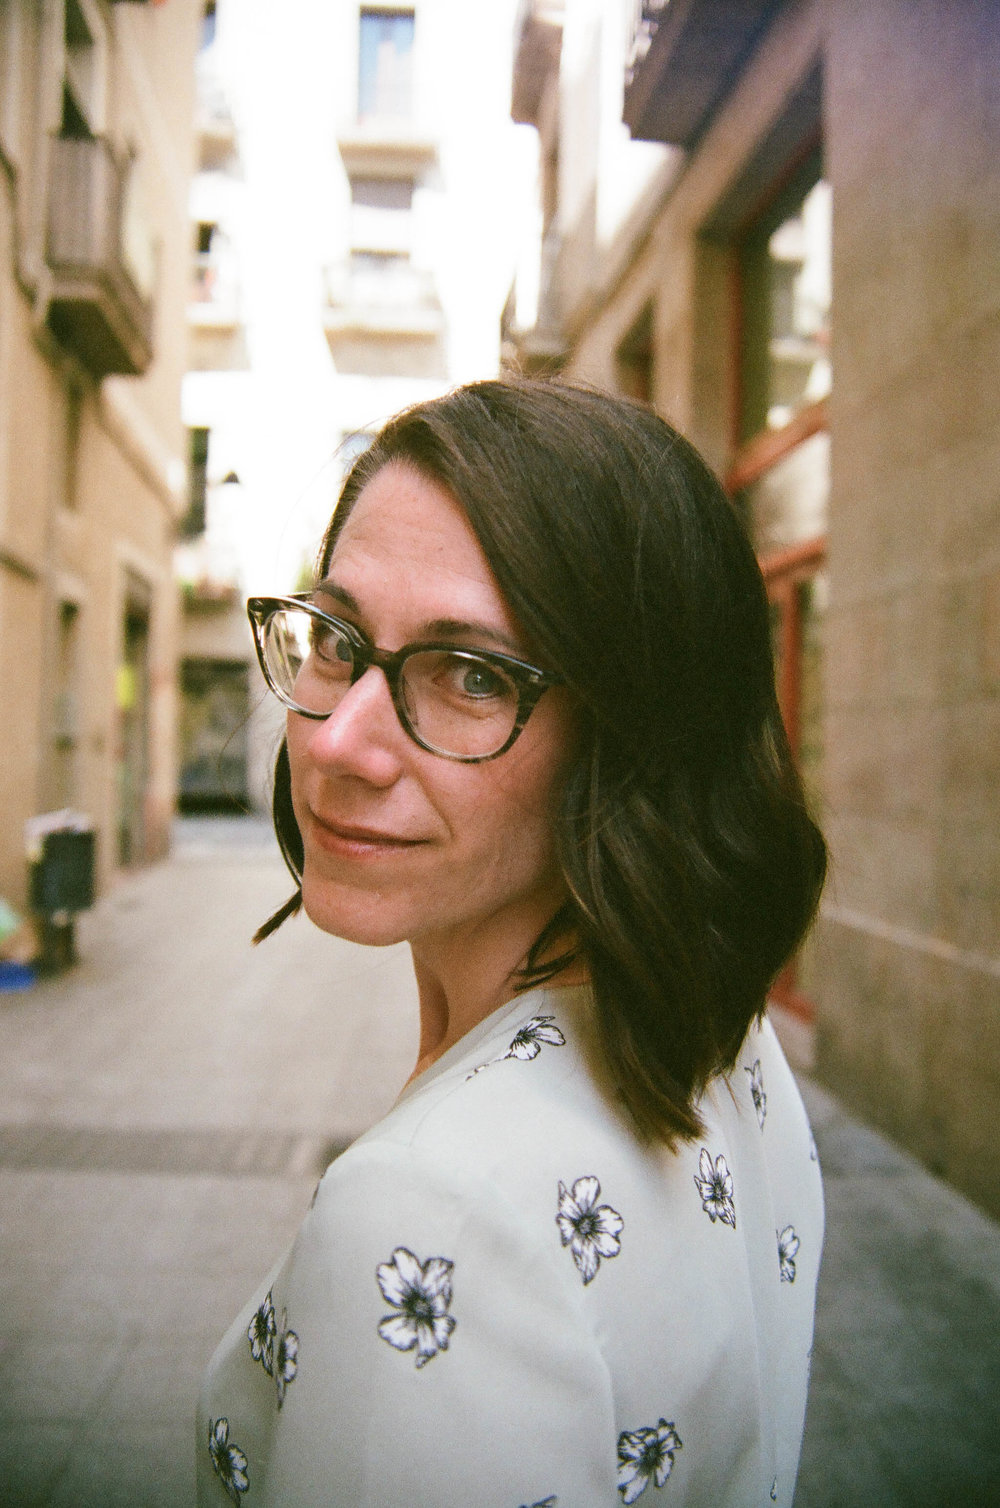 Barcelona_41.jpg